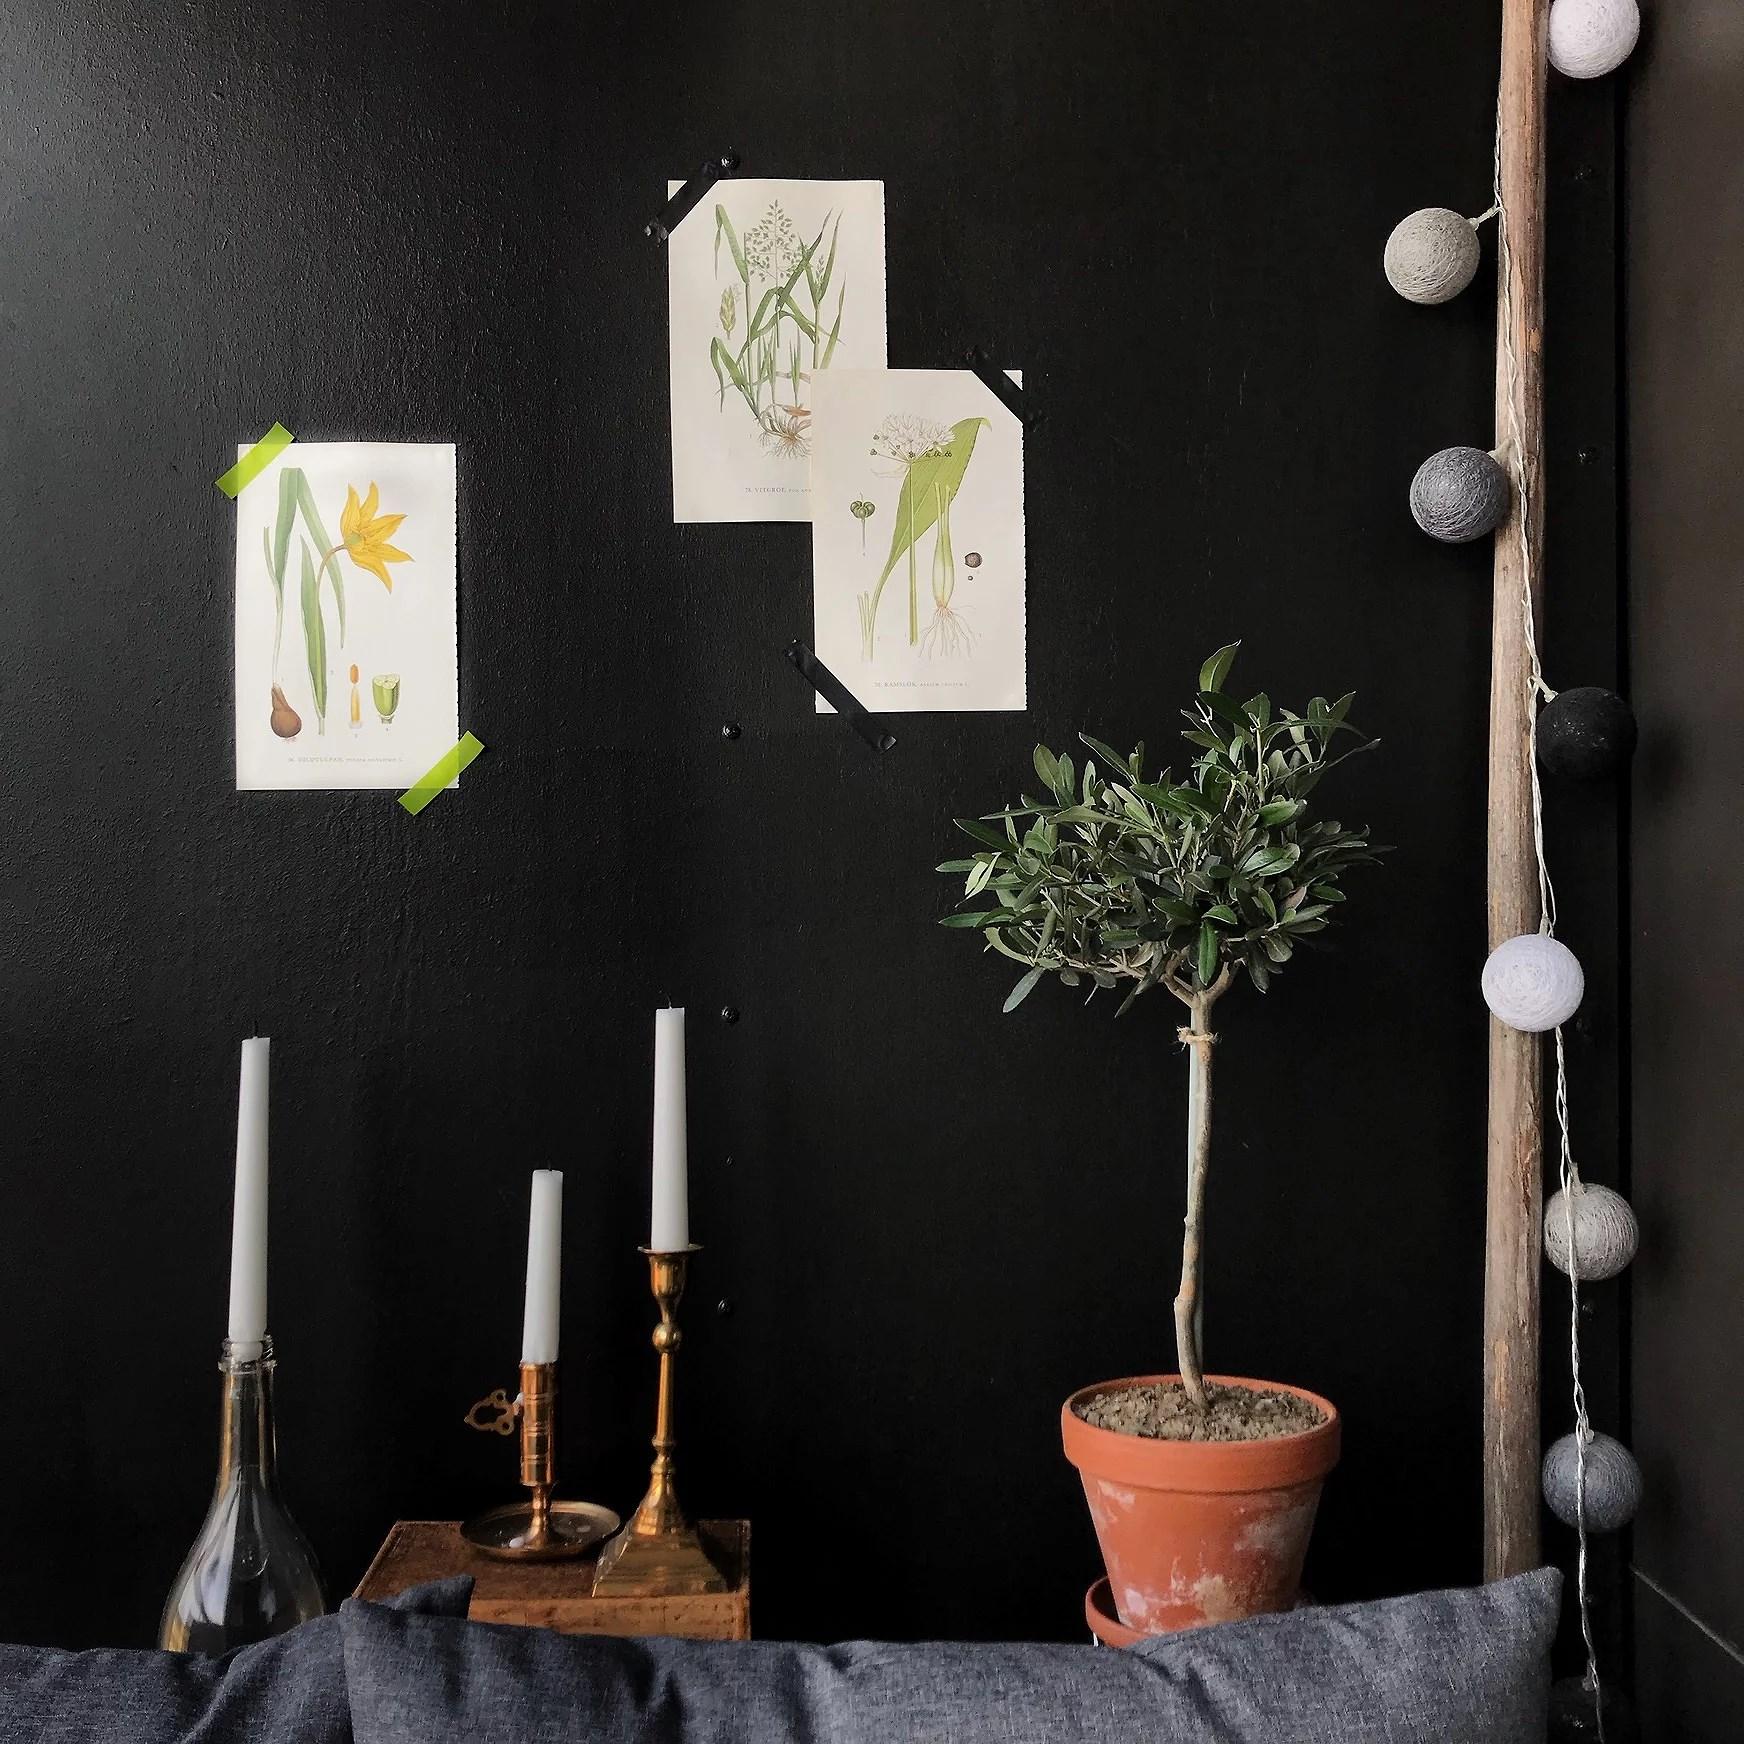 Blom-affischer från en loppis-flora